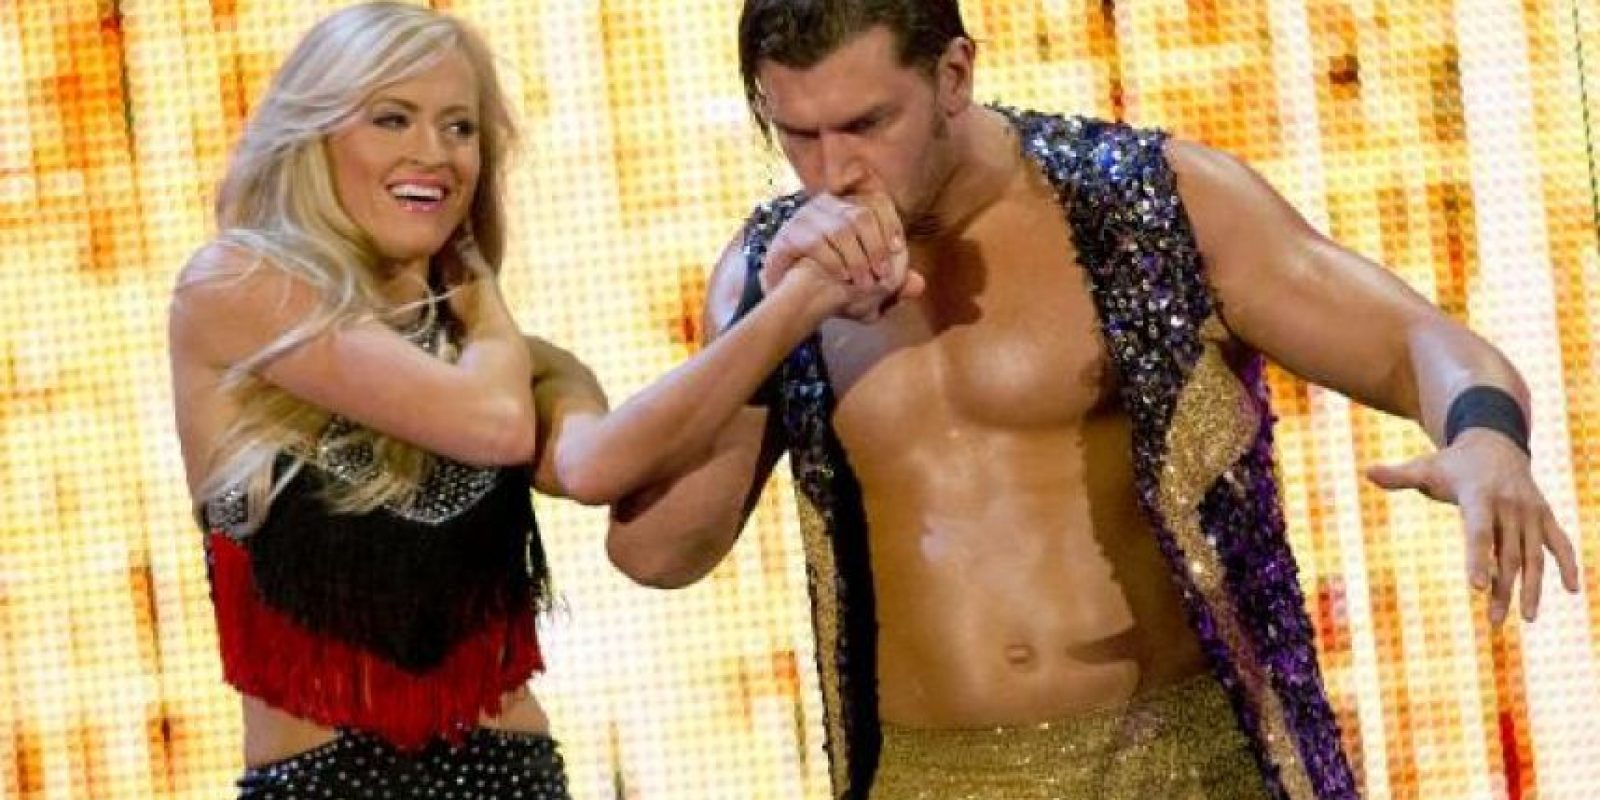 22. Summer Rae y Fandango Foto:WWE